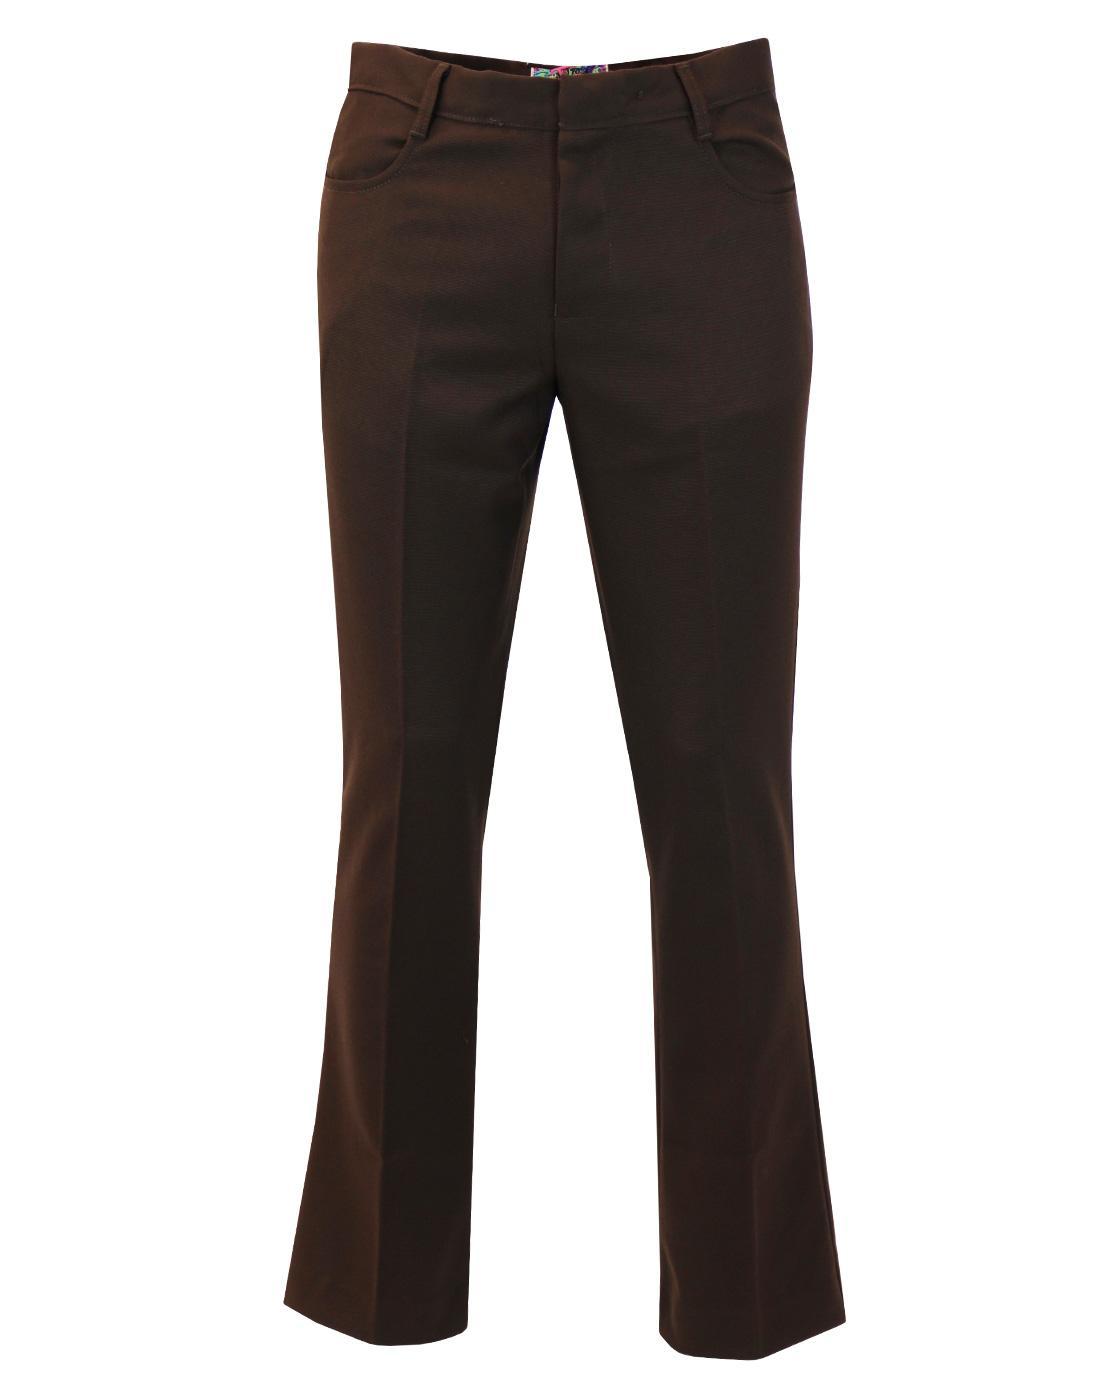 Logan Bootcut MADCAP ENGLAND Hopsack Trousers (Br)